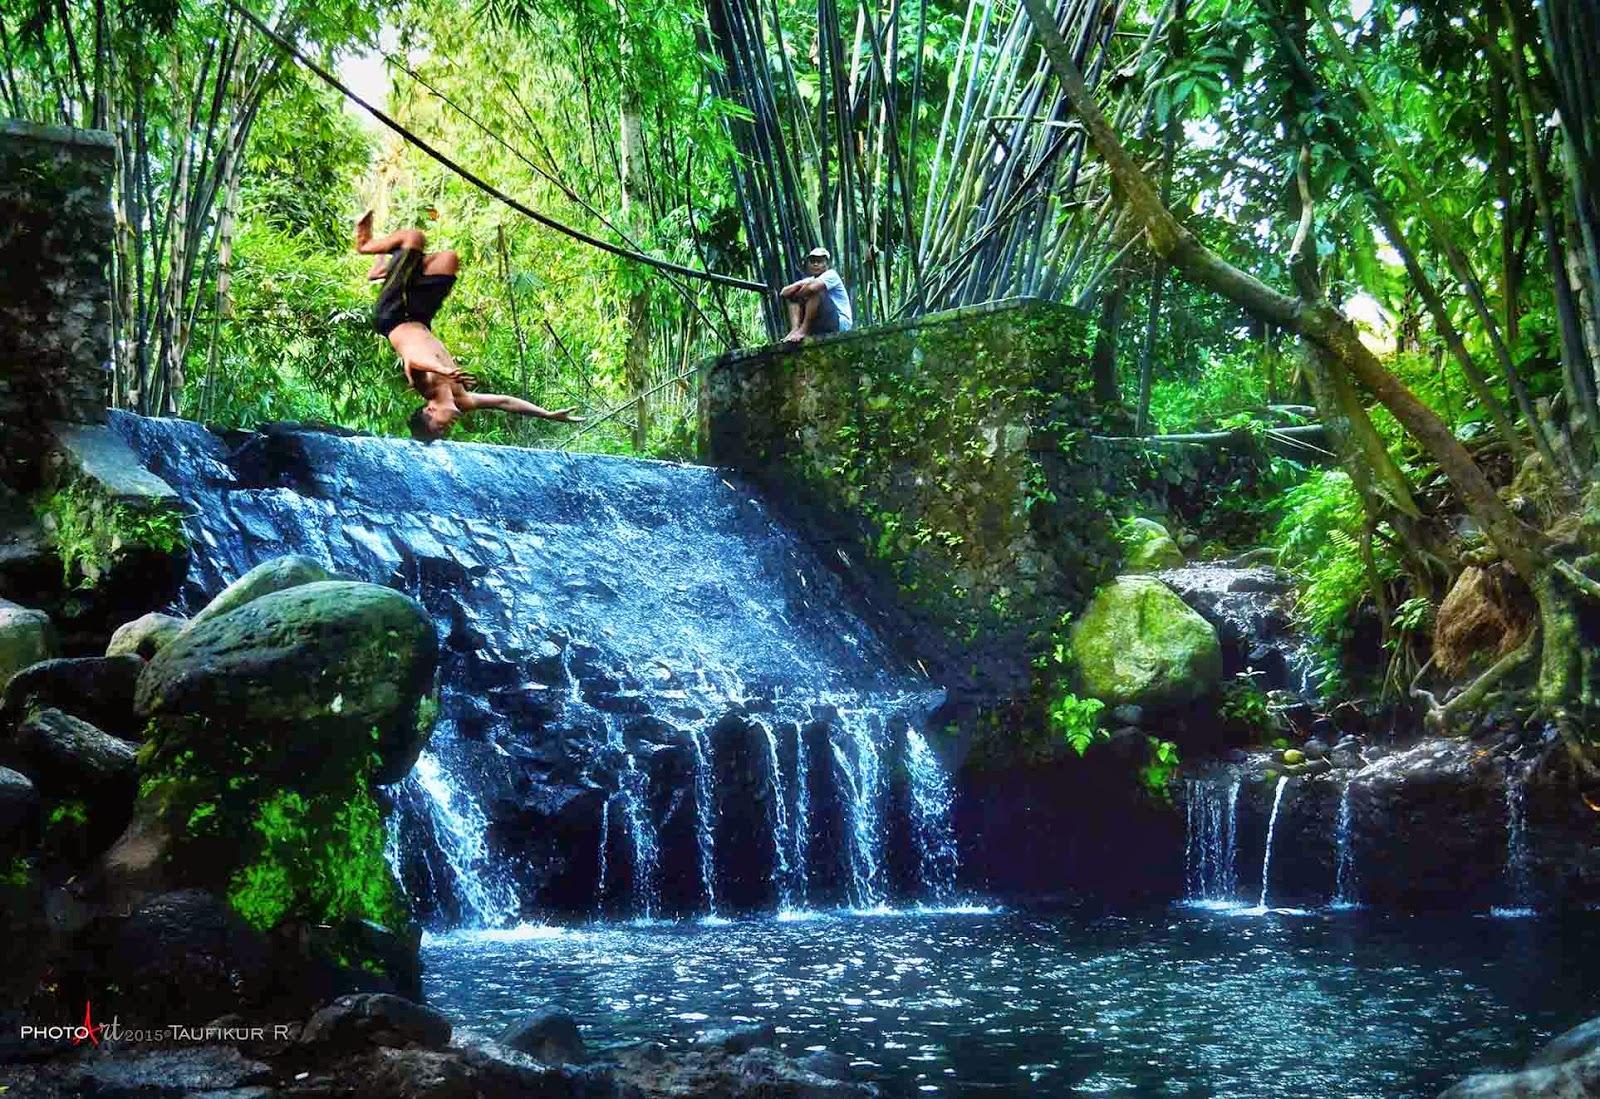 Wisata Alam Blue Lagoon yang Asri di Sleman Yogyakarta - Yogyakarta